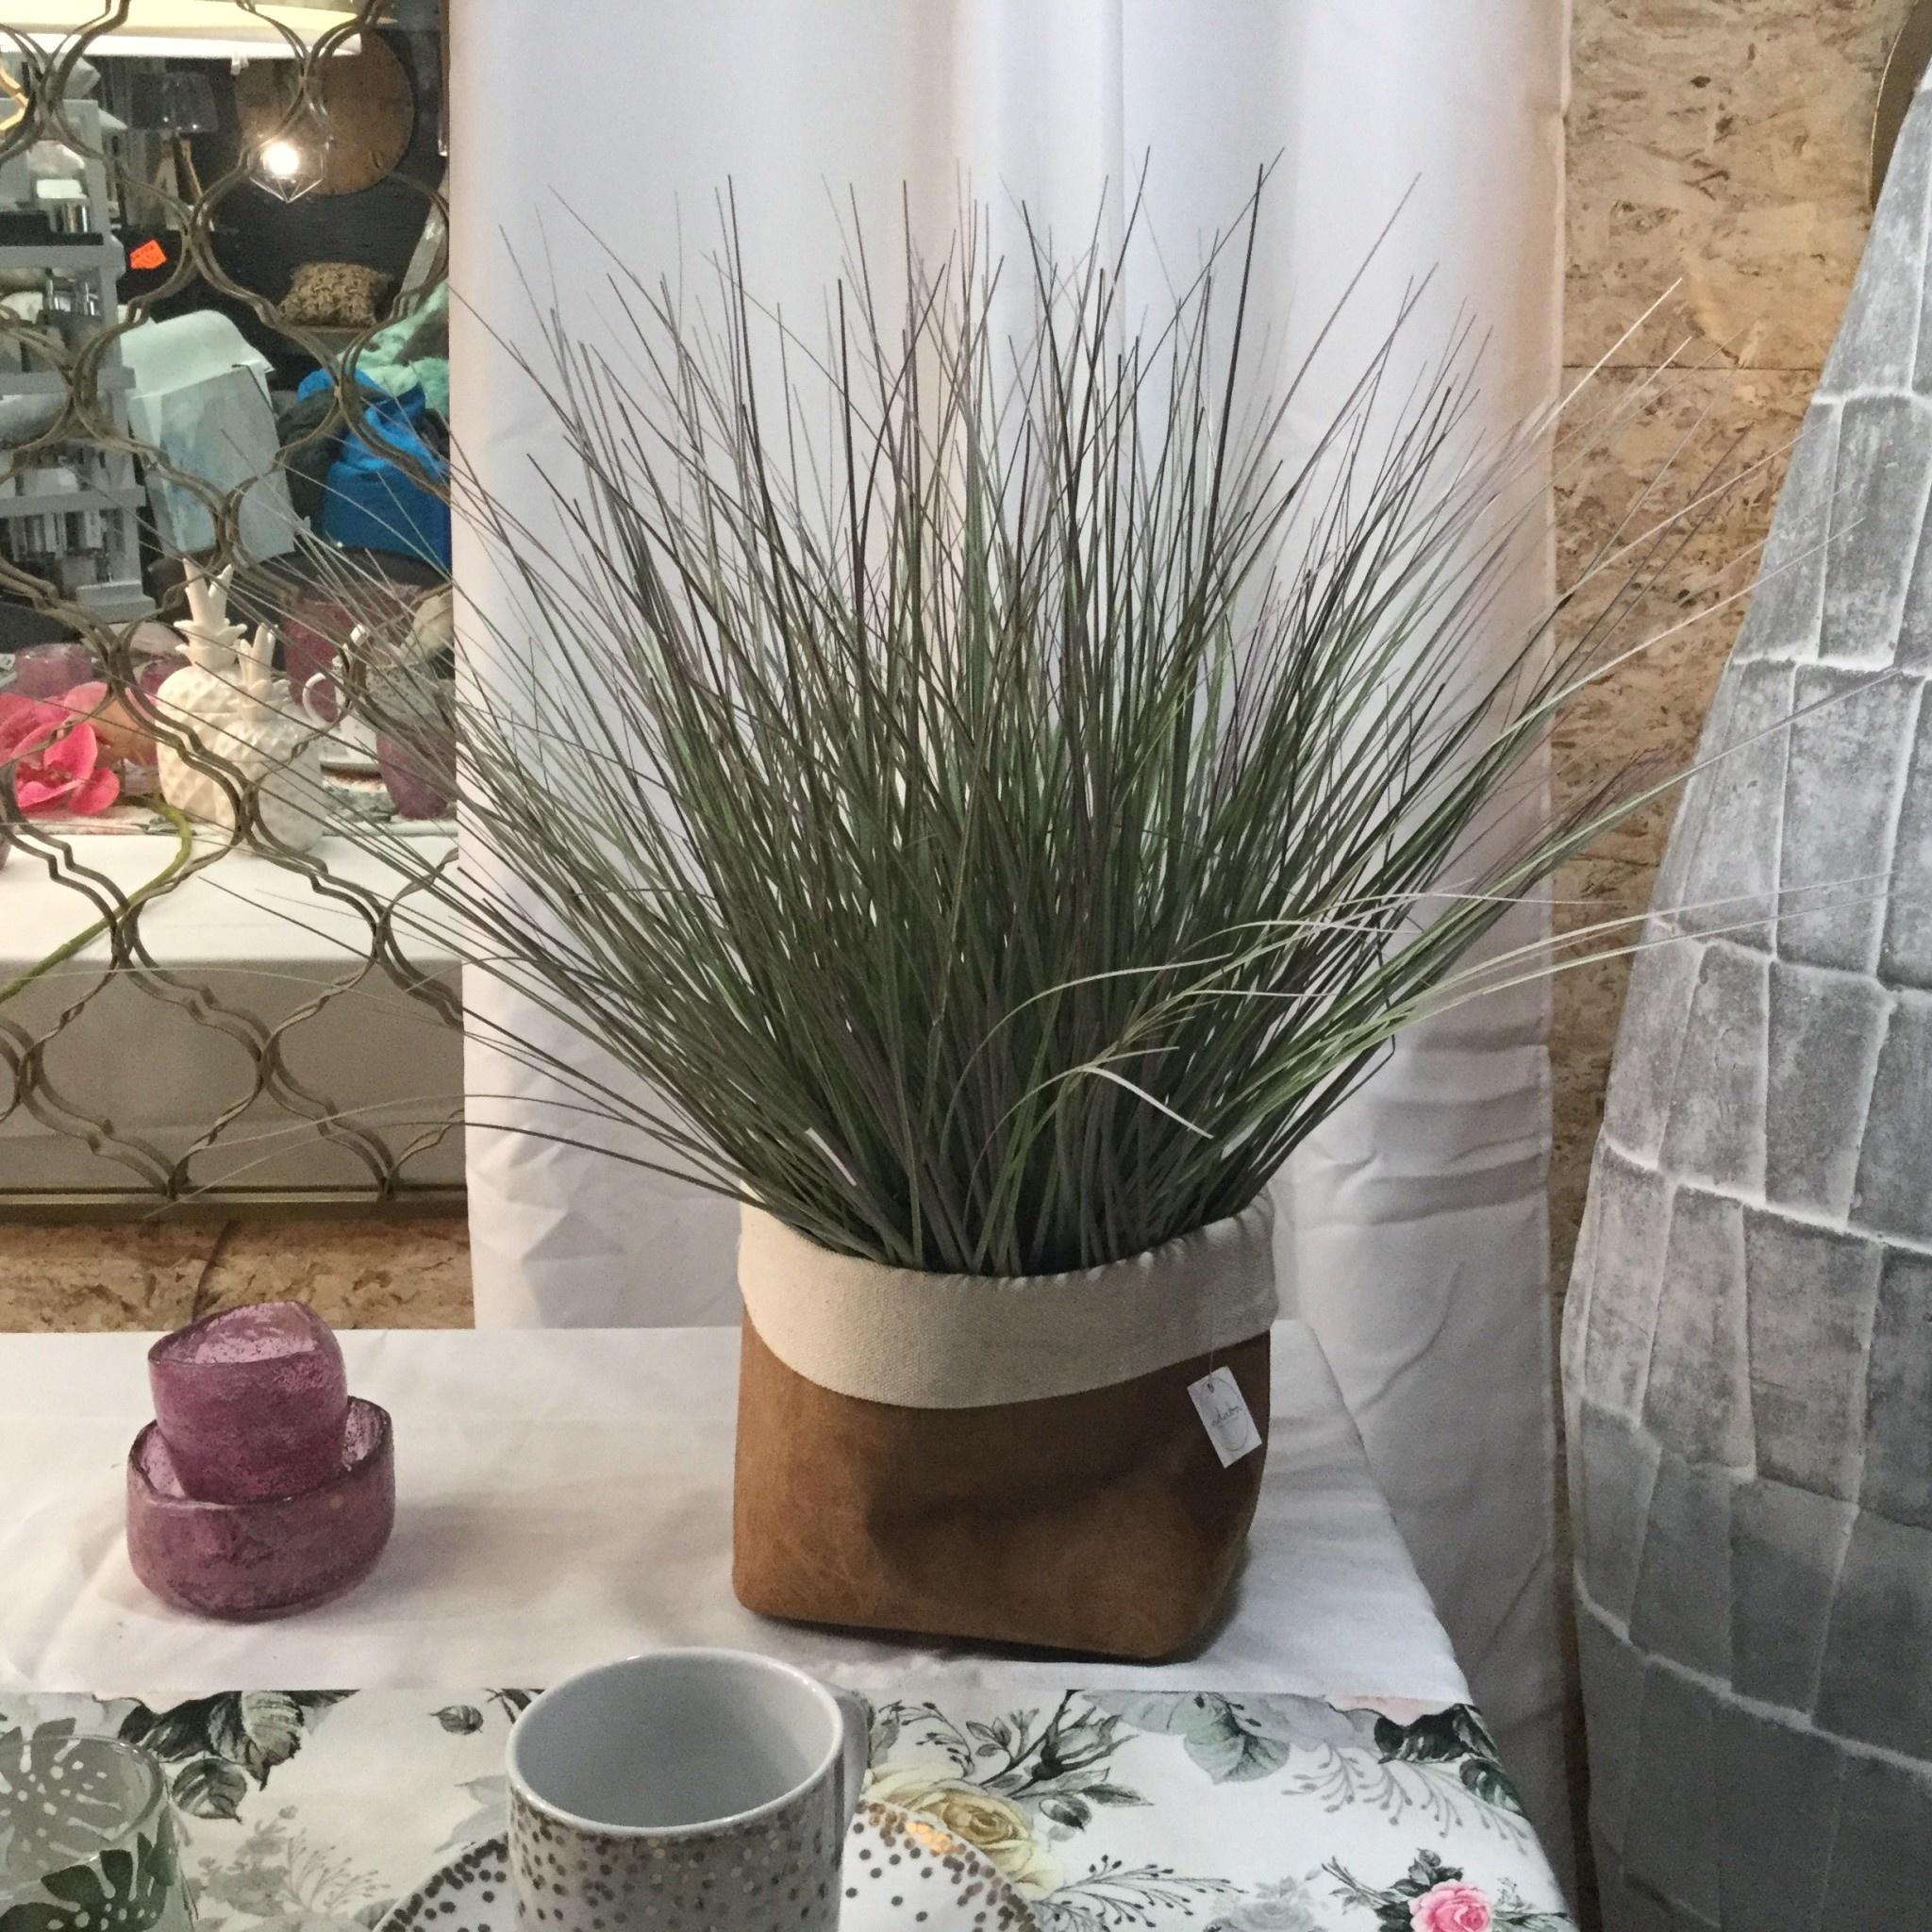 PINK SEASIDE PLANT